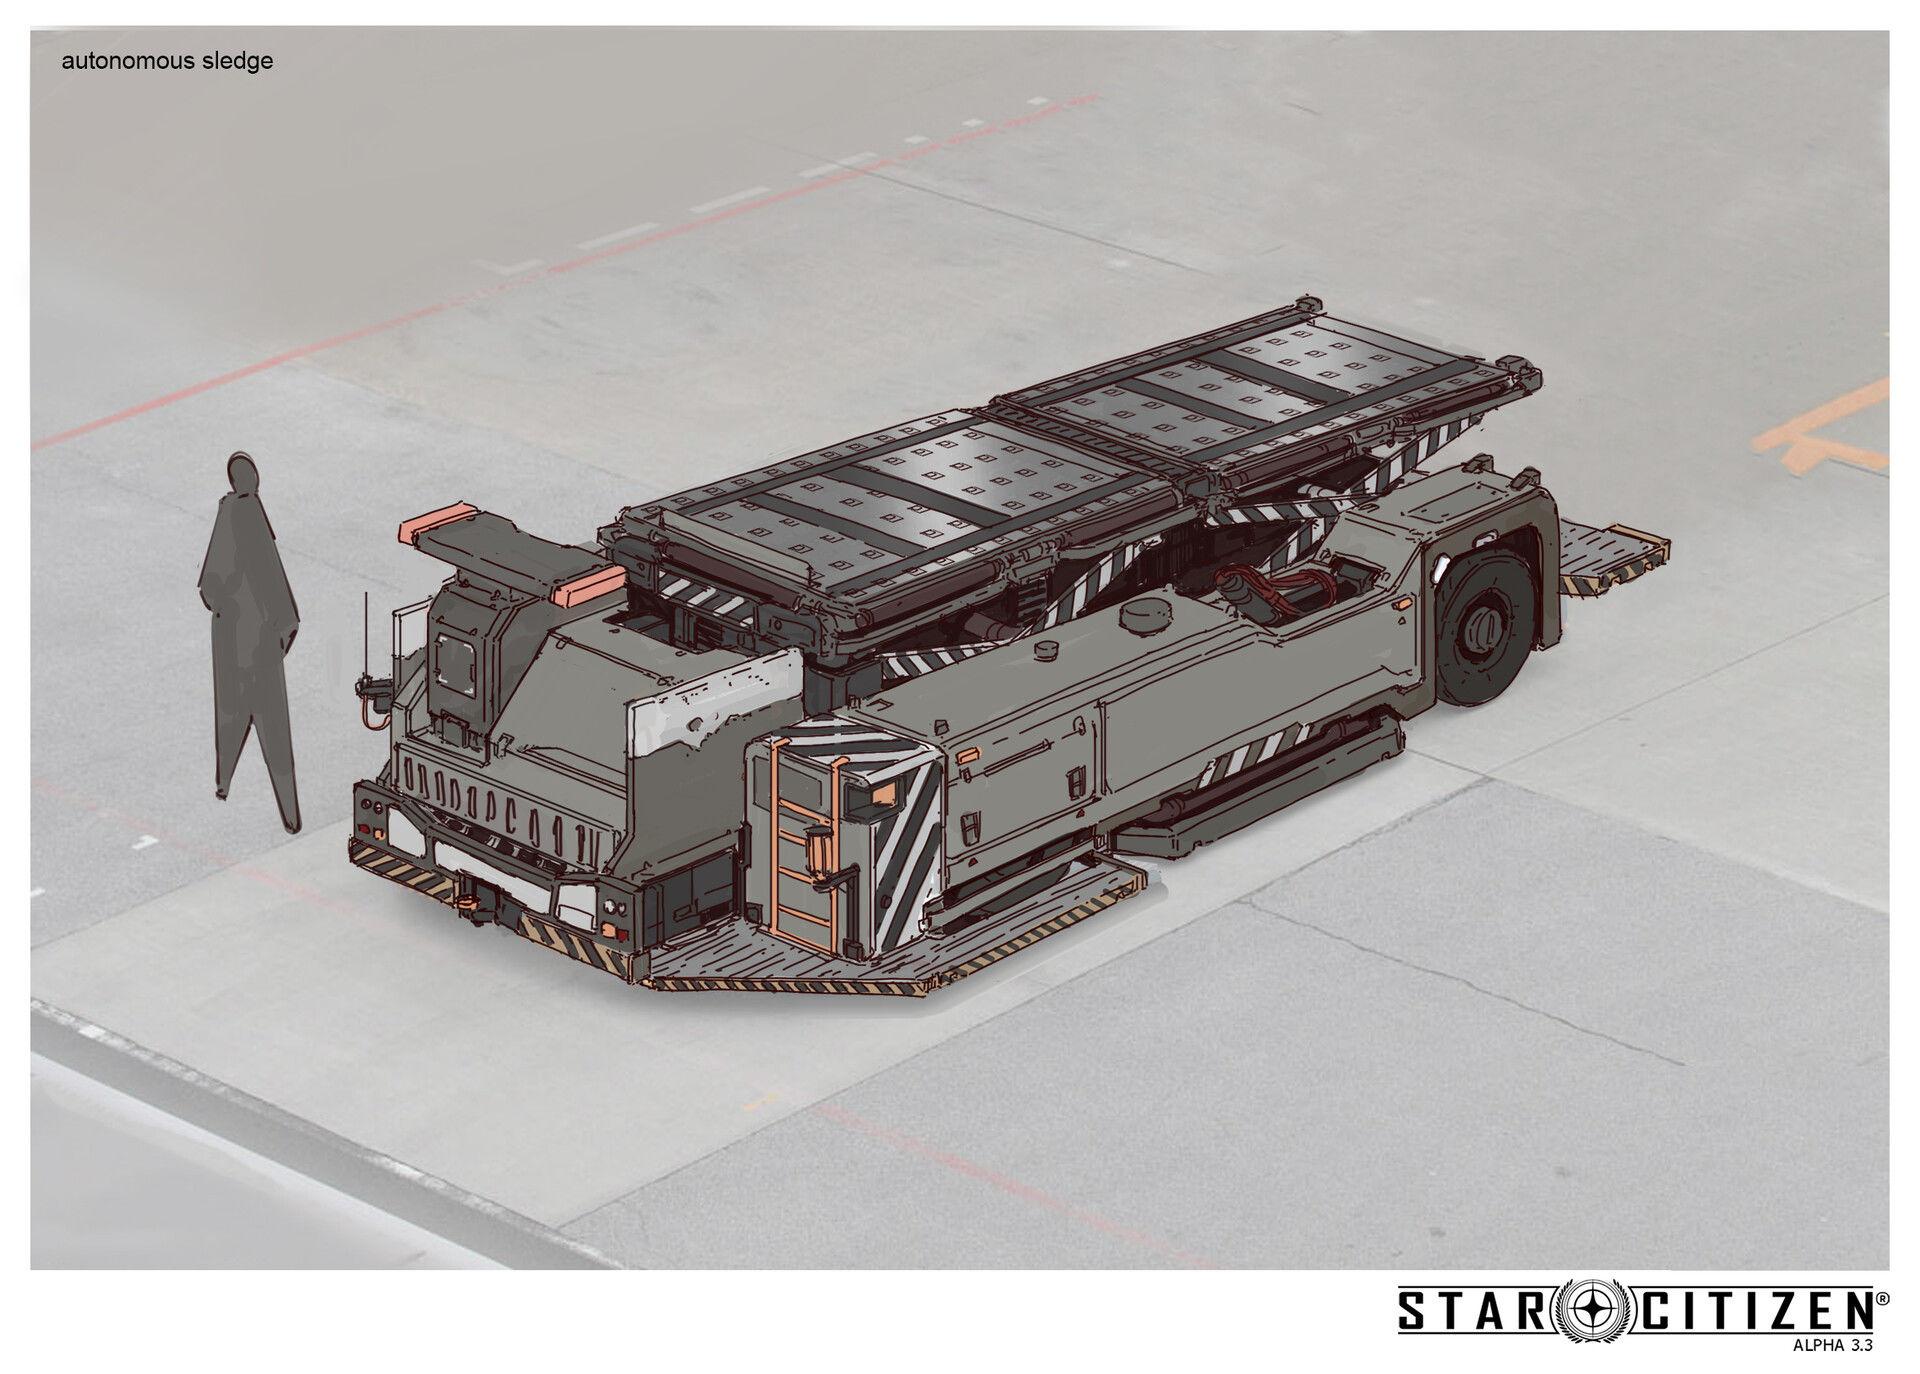 Transporter autonomiczny - koncept 02